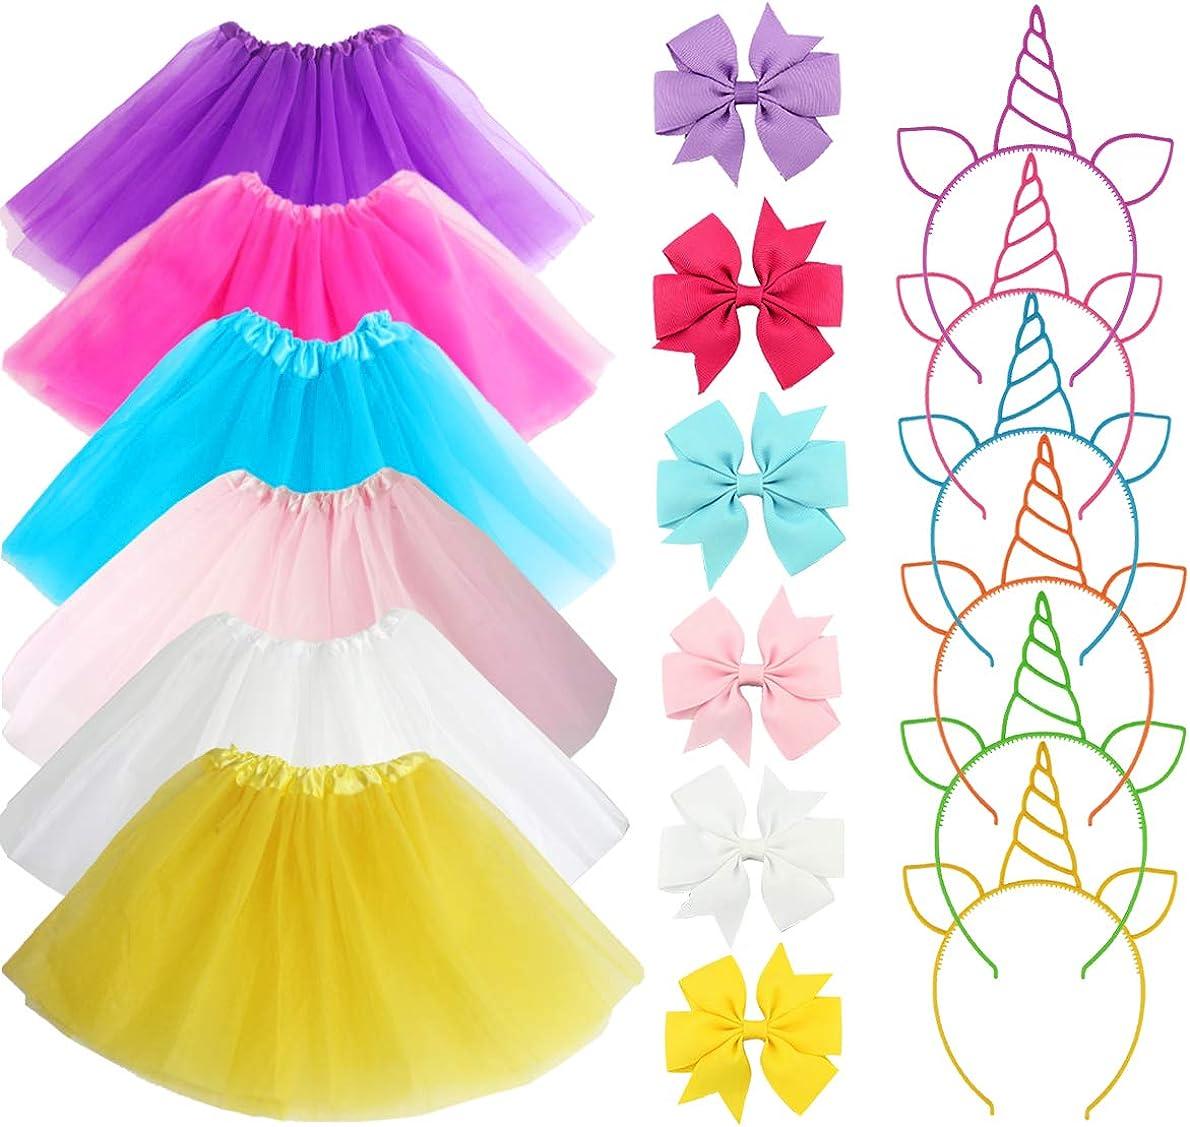 18Pcs Princess Tutus for Girls Ballet Tutu Skirts Multicolor Hair Bands Ties Unicorn Headbands Birthday Party Favor Gifts Princess Dress Up Costume 3-Layer Ballet Dance Tutus Skirts for Girls